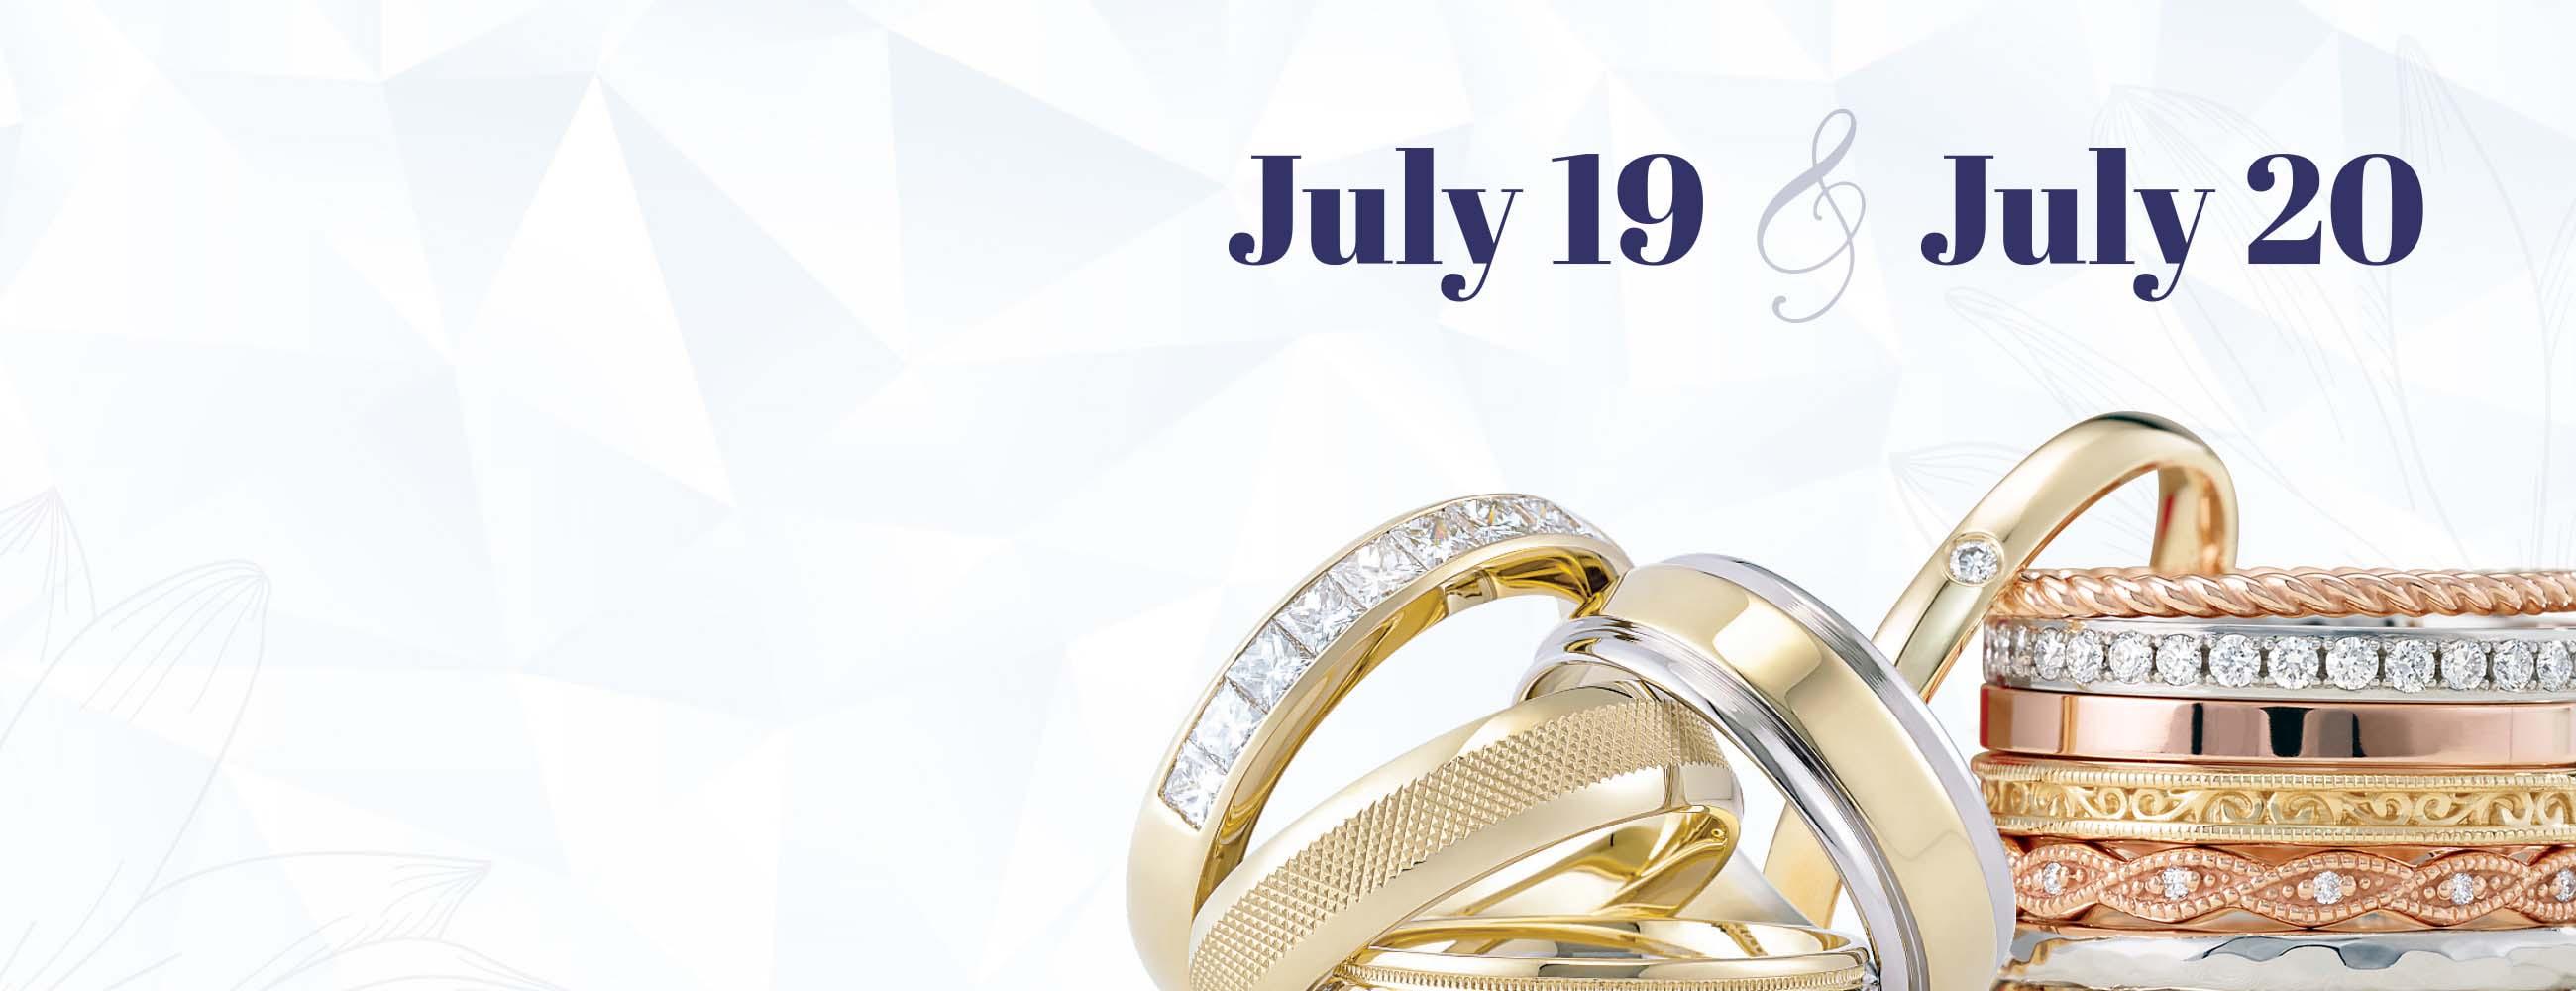 WATERVILLE & AUGUSTA WEDDING BAND EVENTS